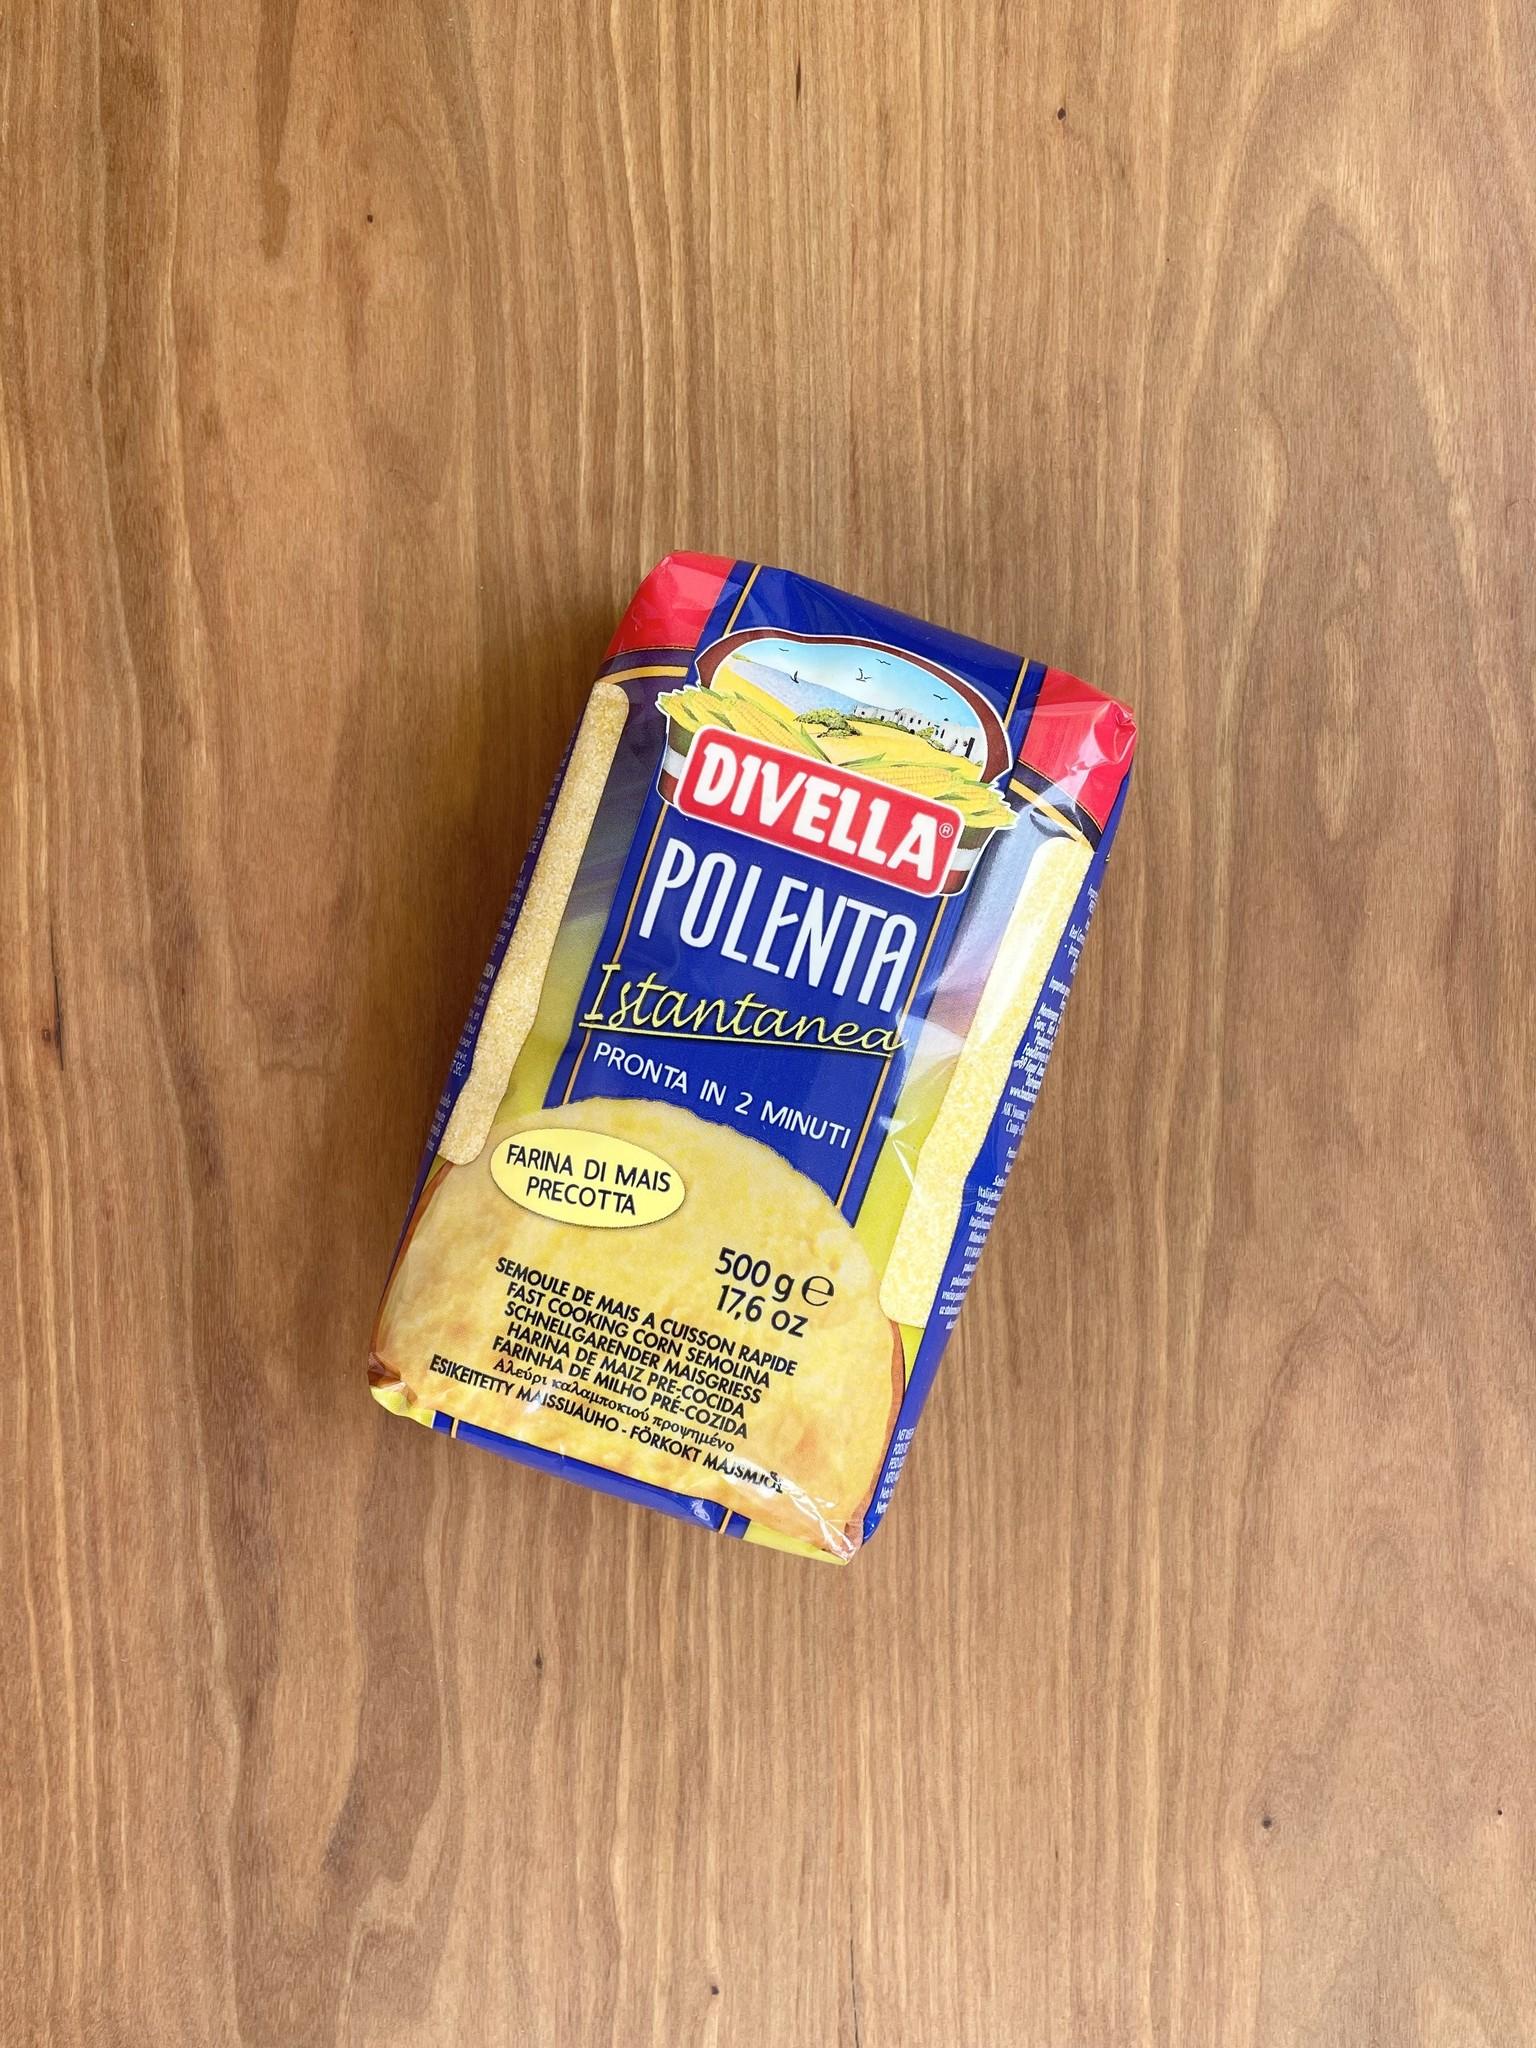 Pastene  / Divella Instant Polenta 1.1 lb-1